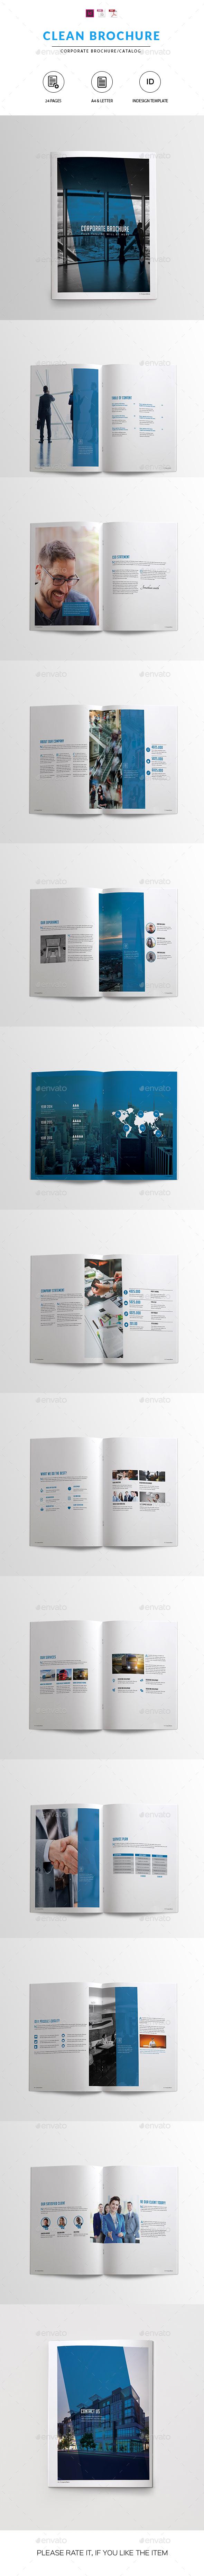 Clean Corporate Brochure/Catalog - Catalogs Brochures